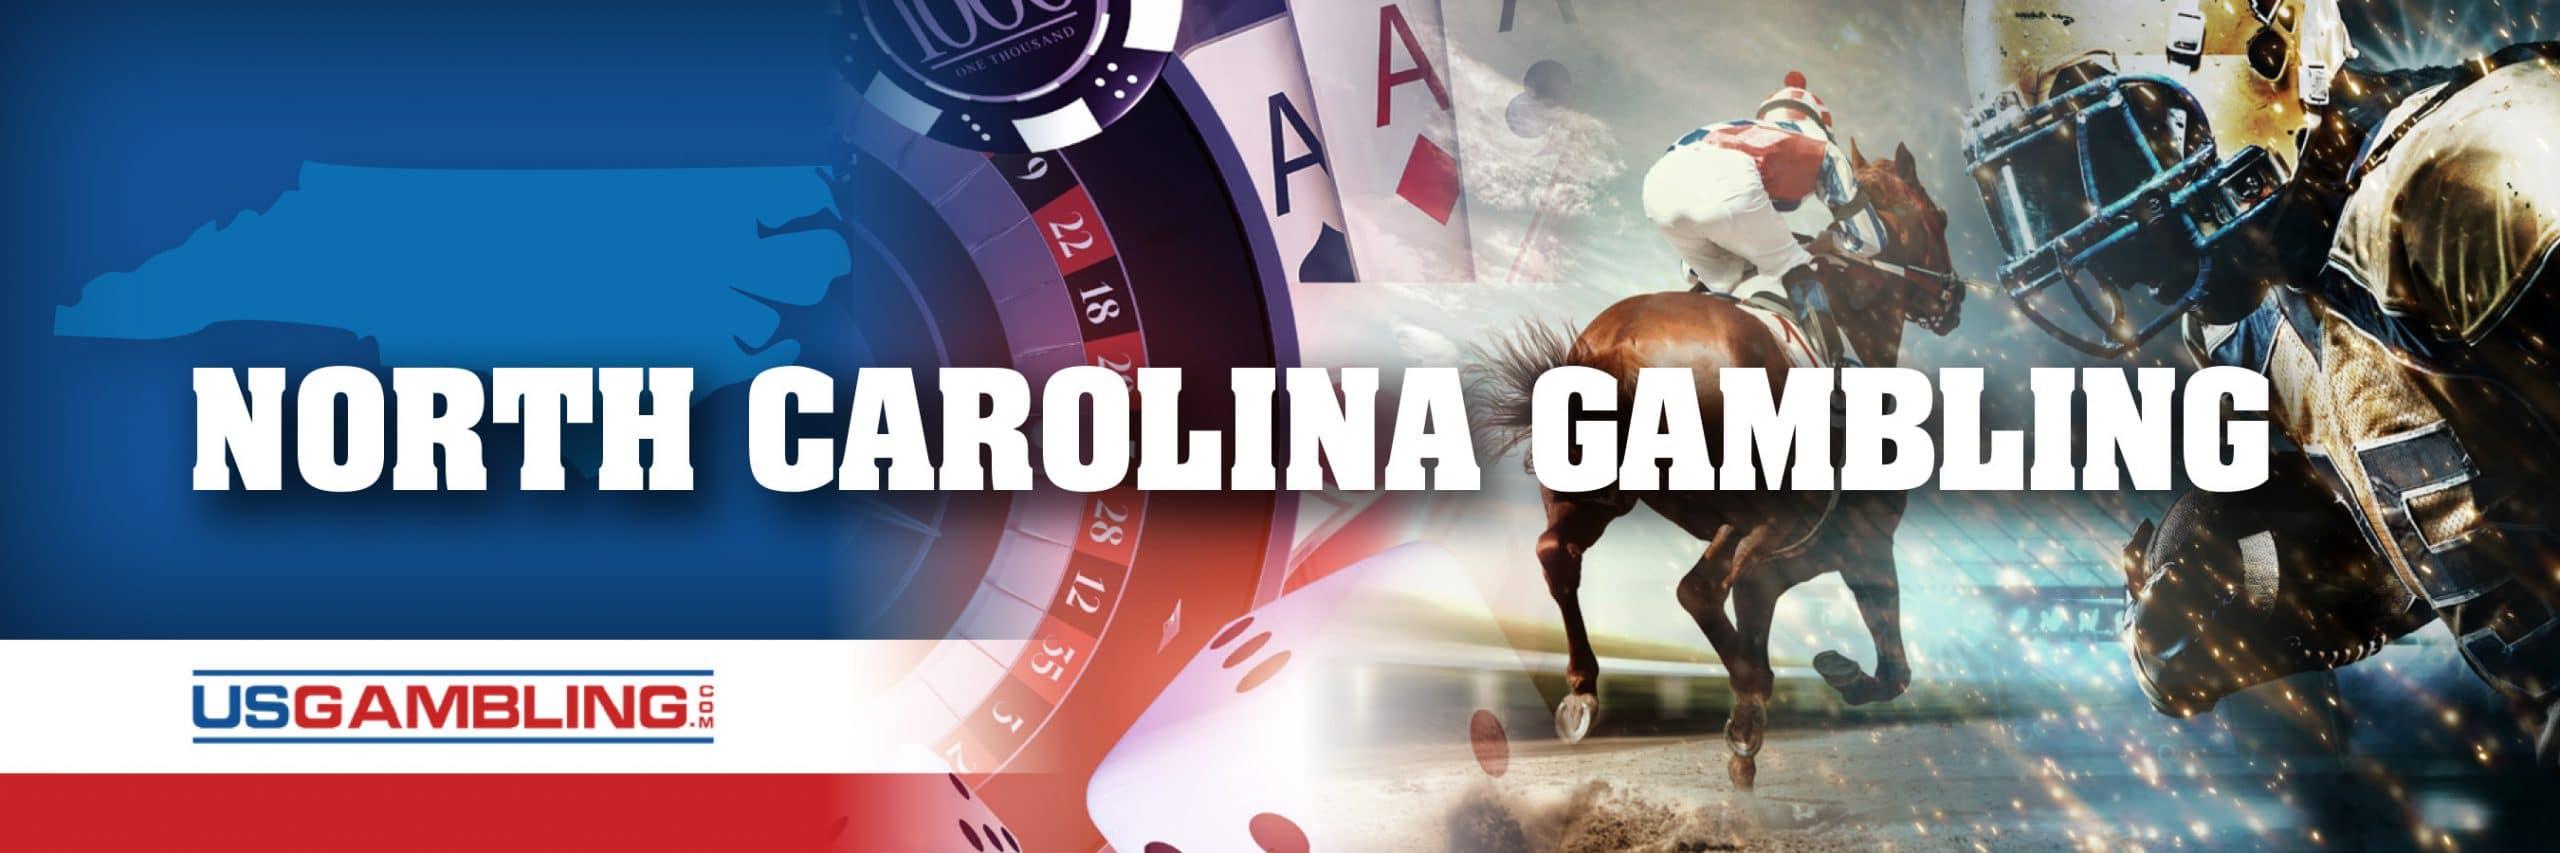 Legal North Carolina Gambling